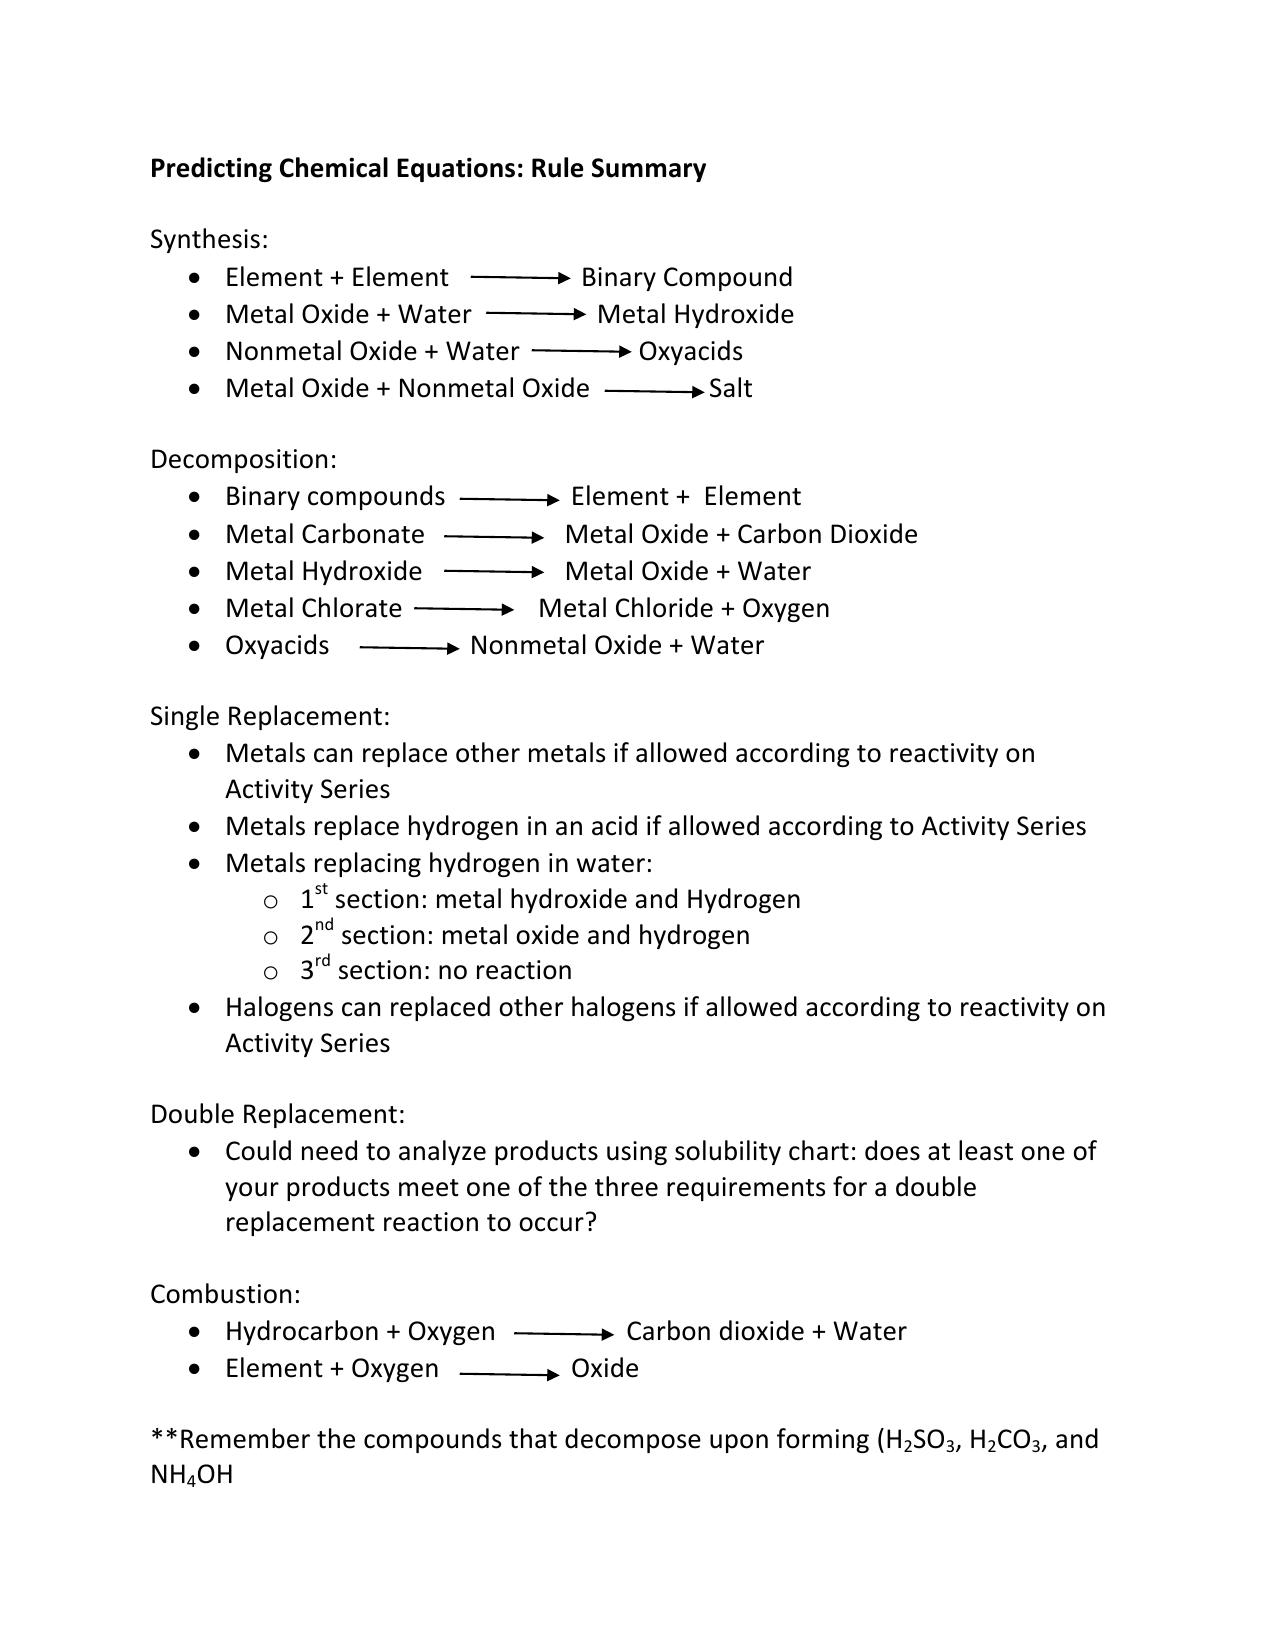 Predicting Rules Summary Sheet